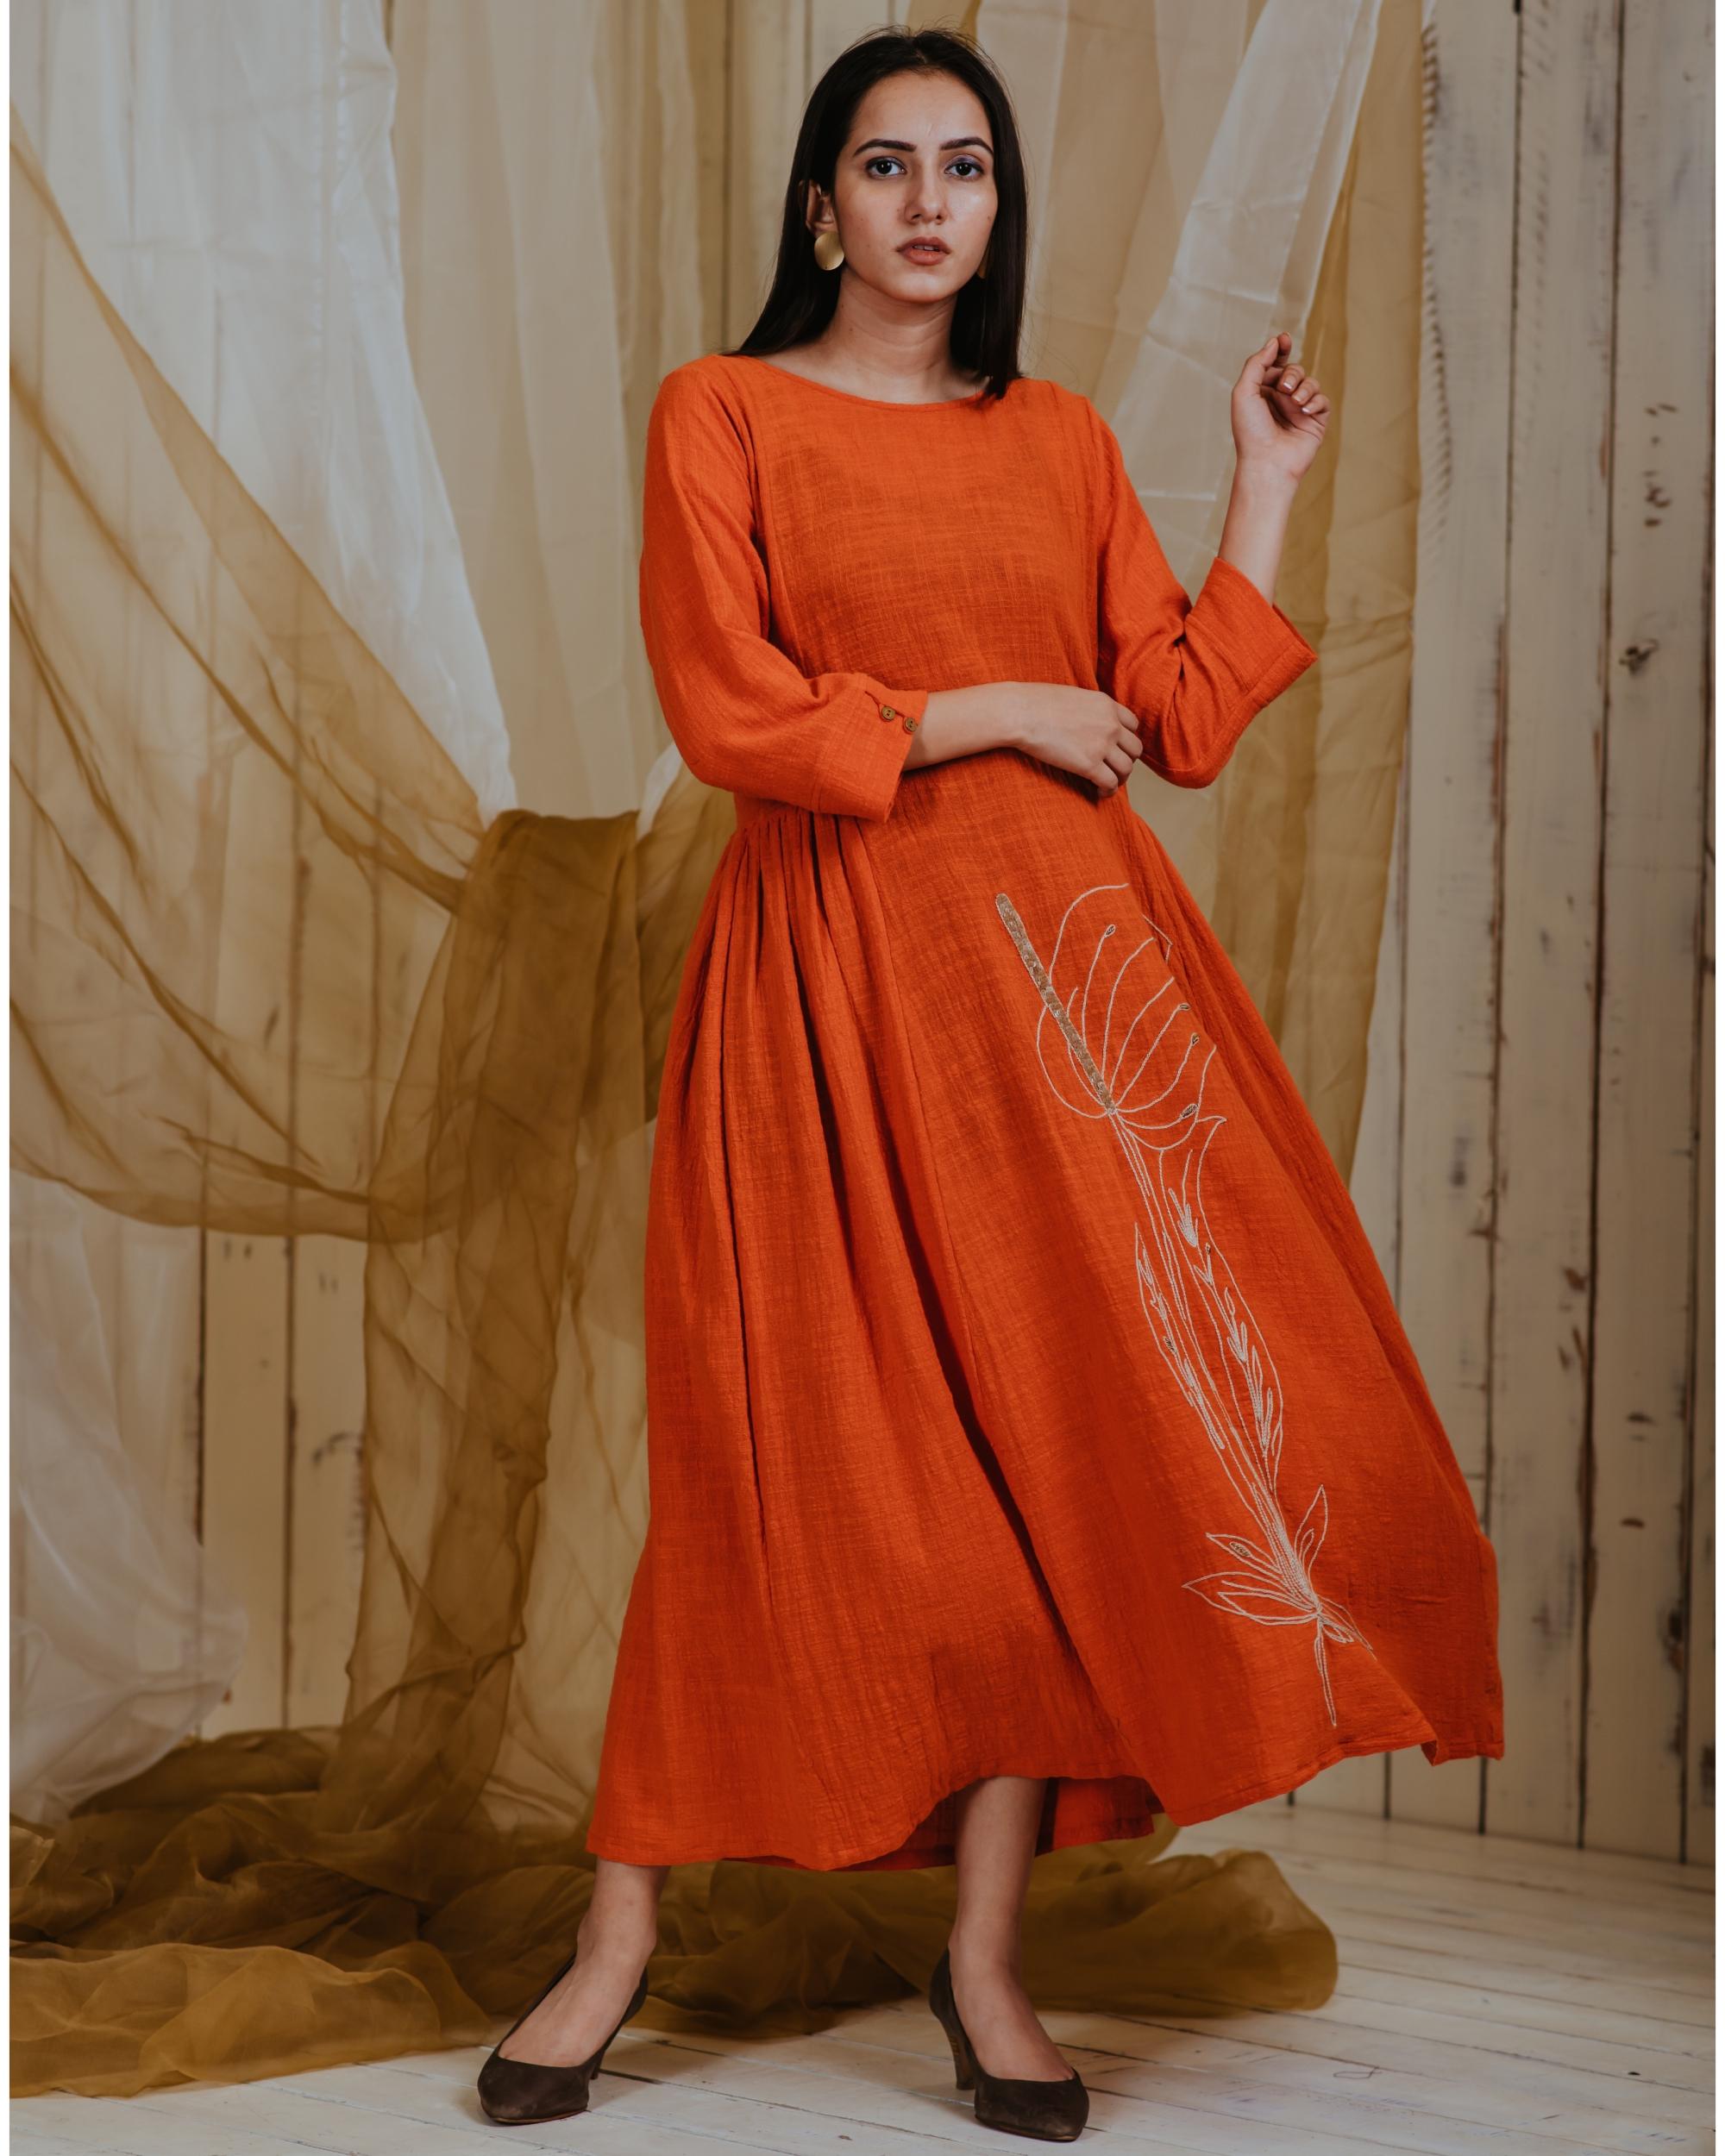 Tangerine anthurium dress